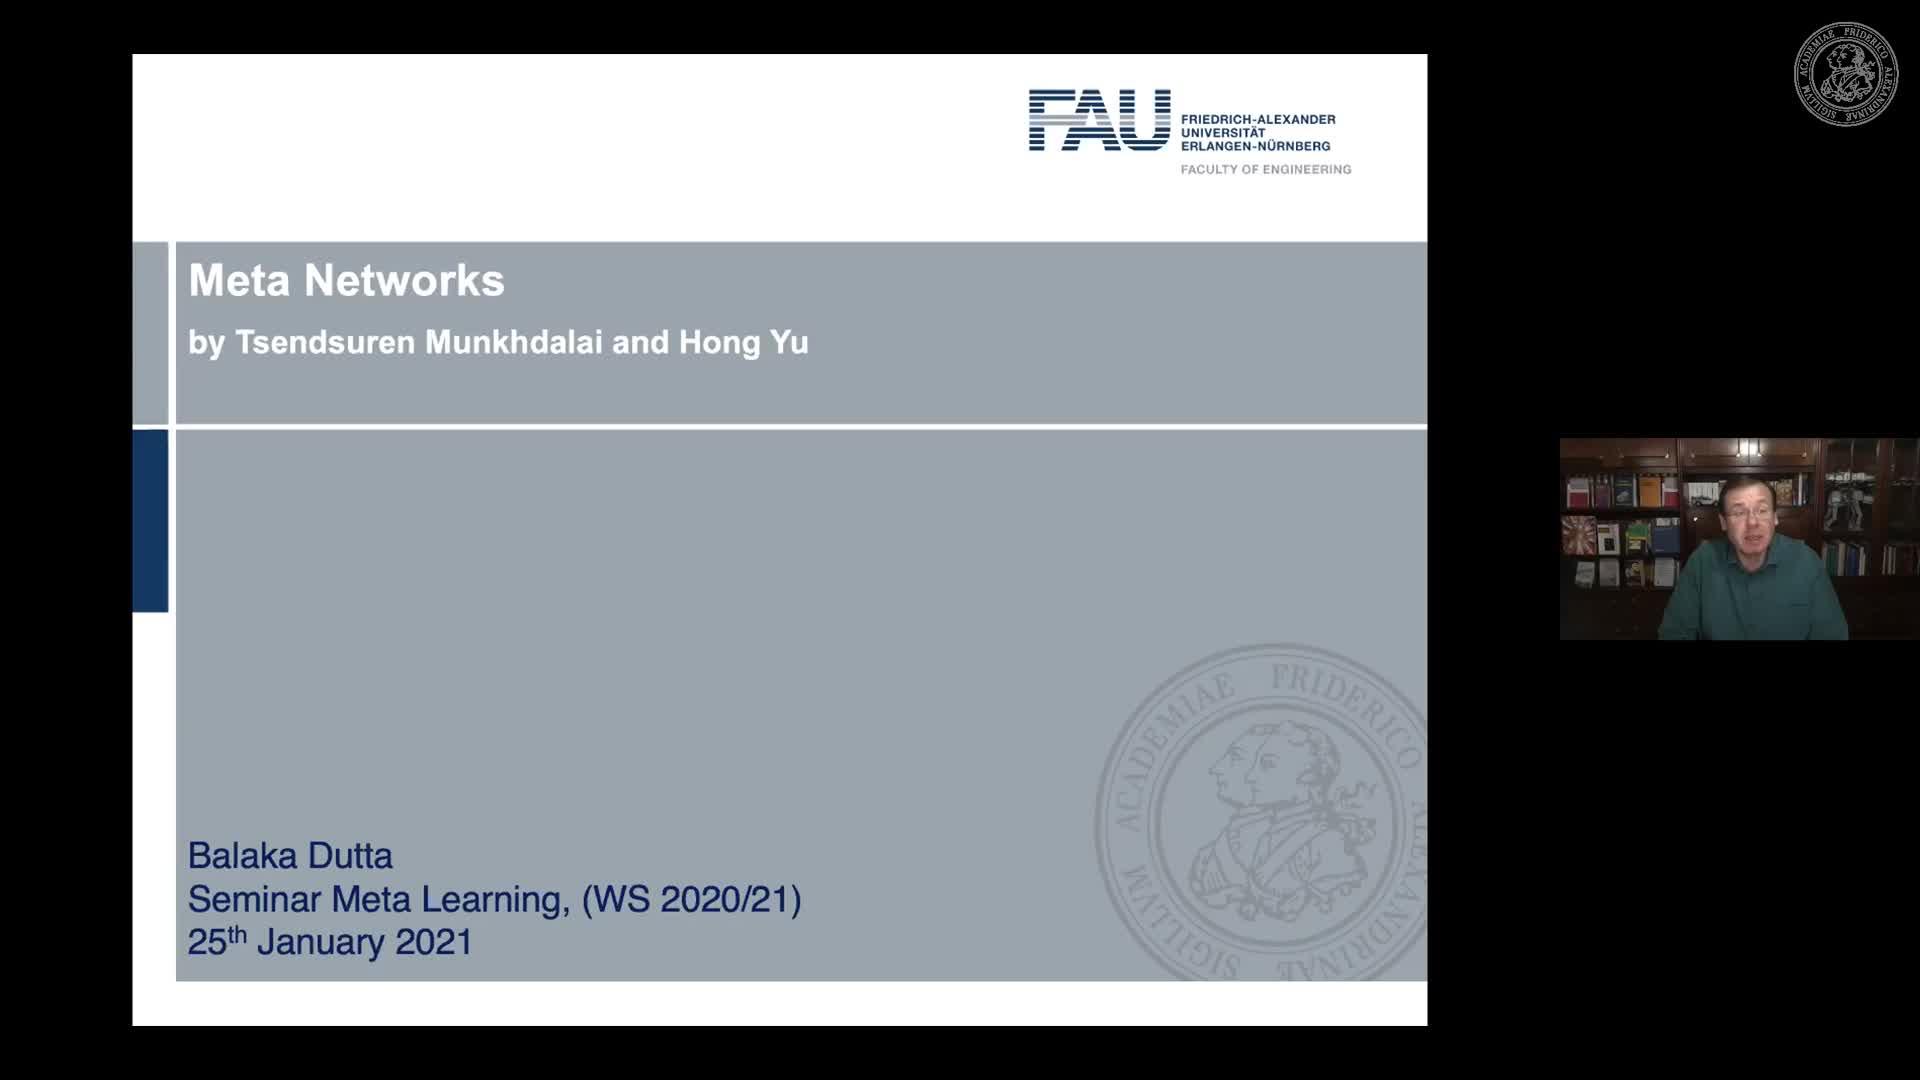 Seminar Meta Learning (SemMeL) - Balaka Dutta - Meta Networks preview image